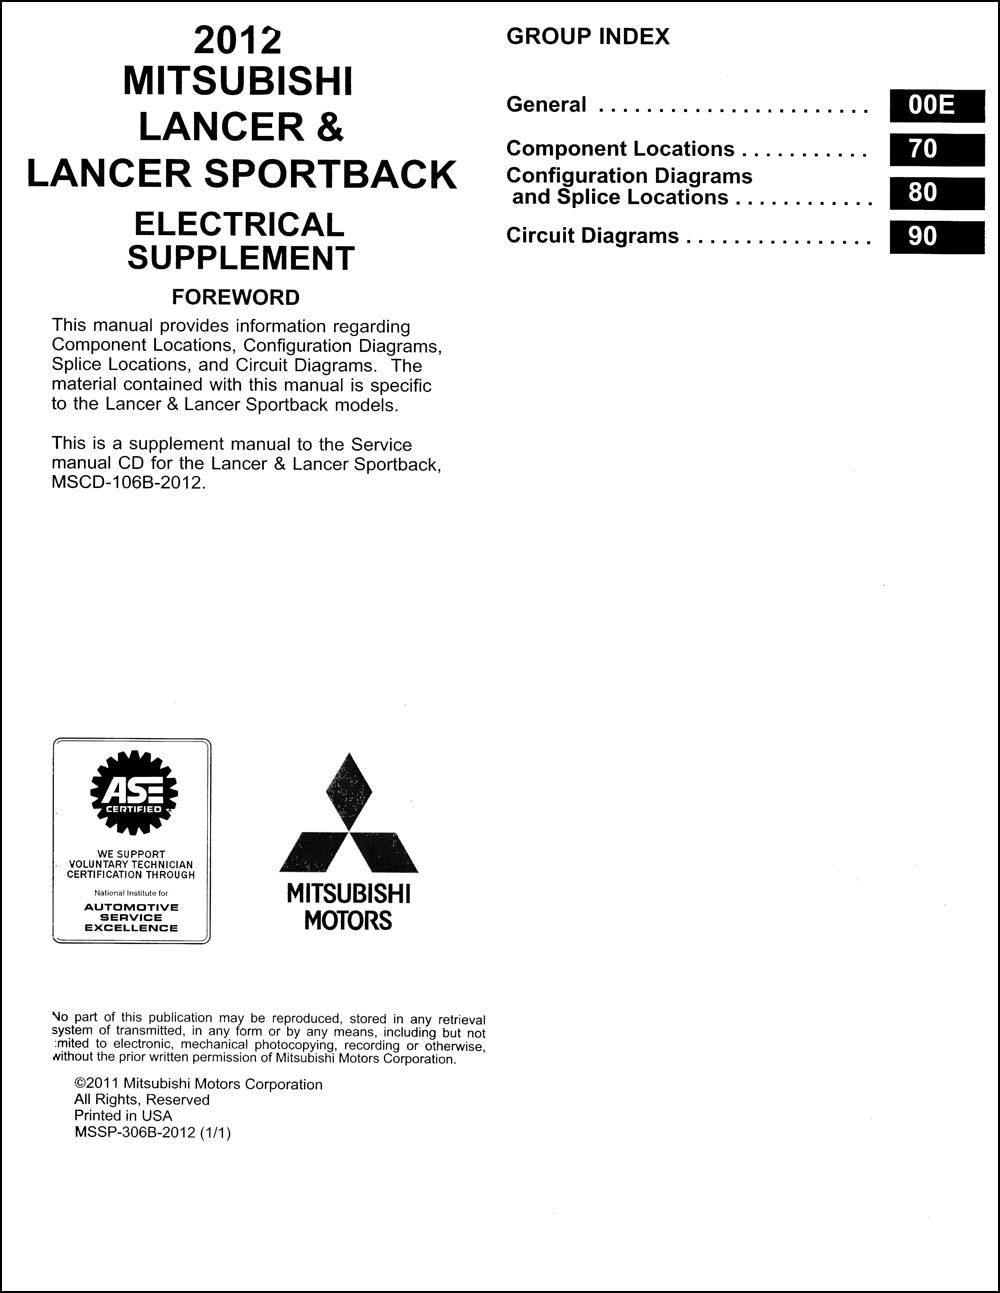 Diagram 2005 Mitsubishi Lancer Evolution Wiring Diagram Original Full Version Hd Quality Diagram Original Schematico2l Artemideverde It